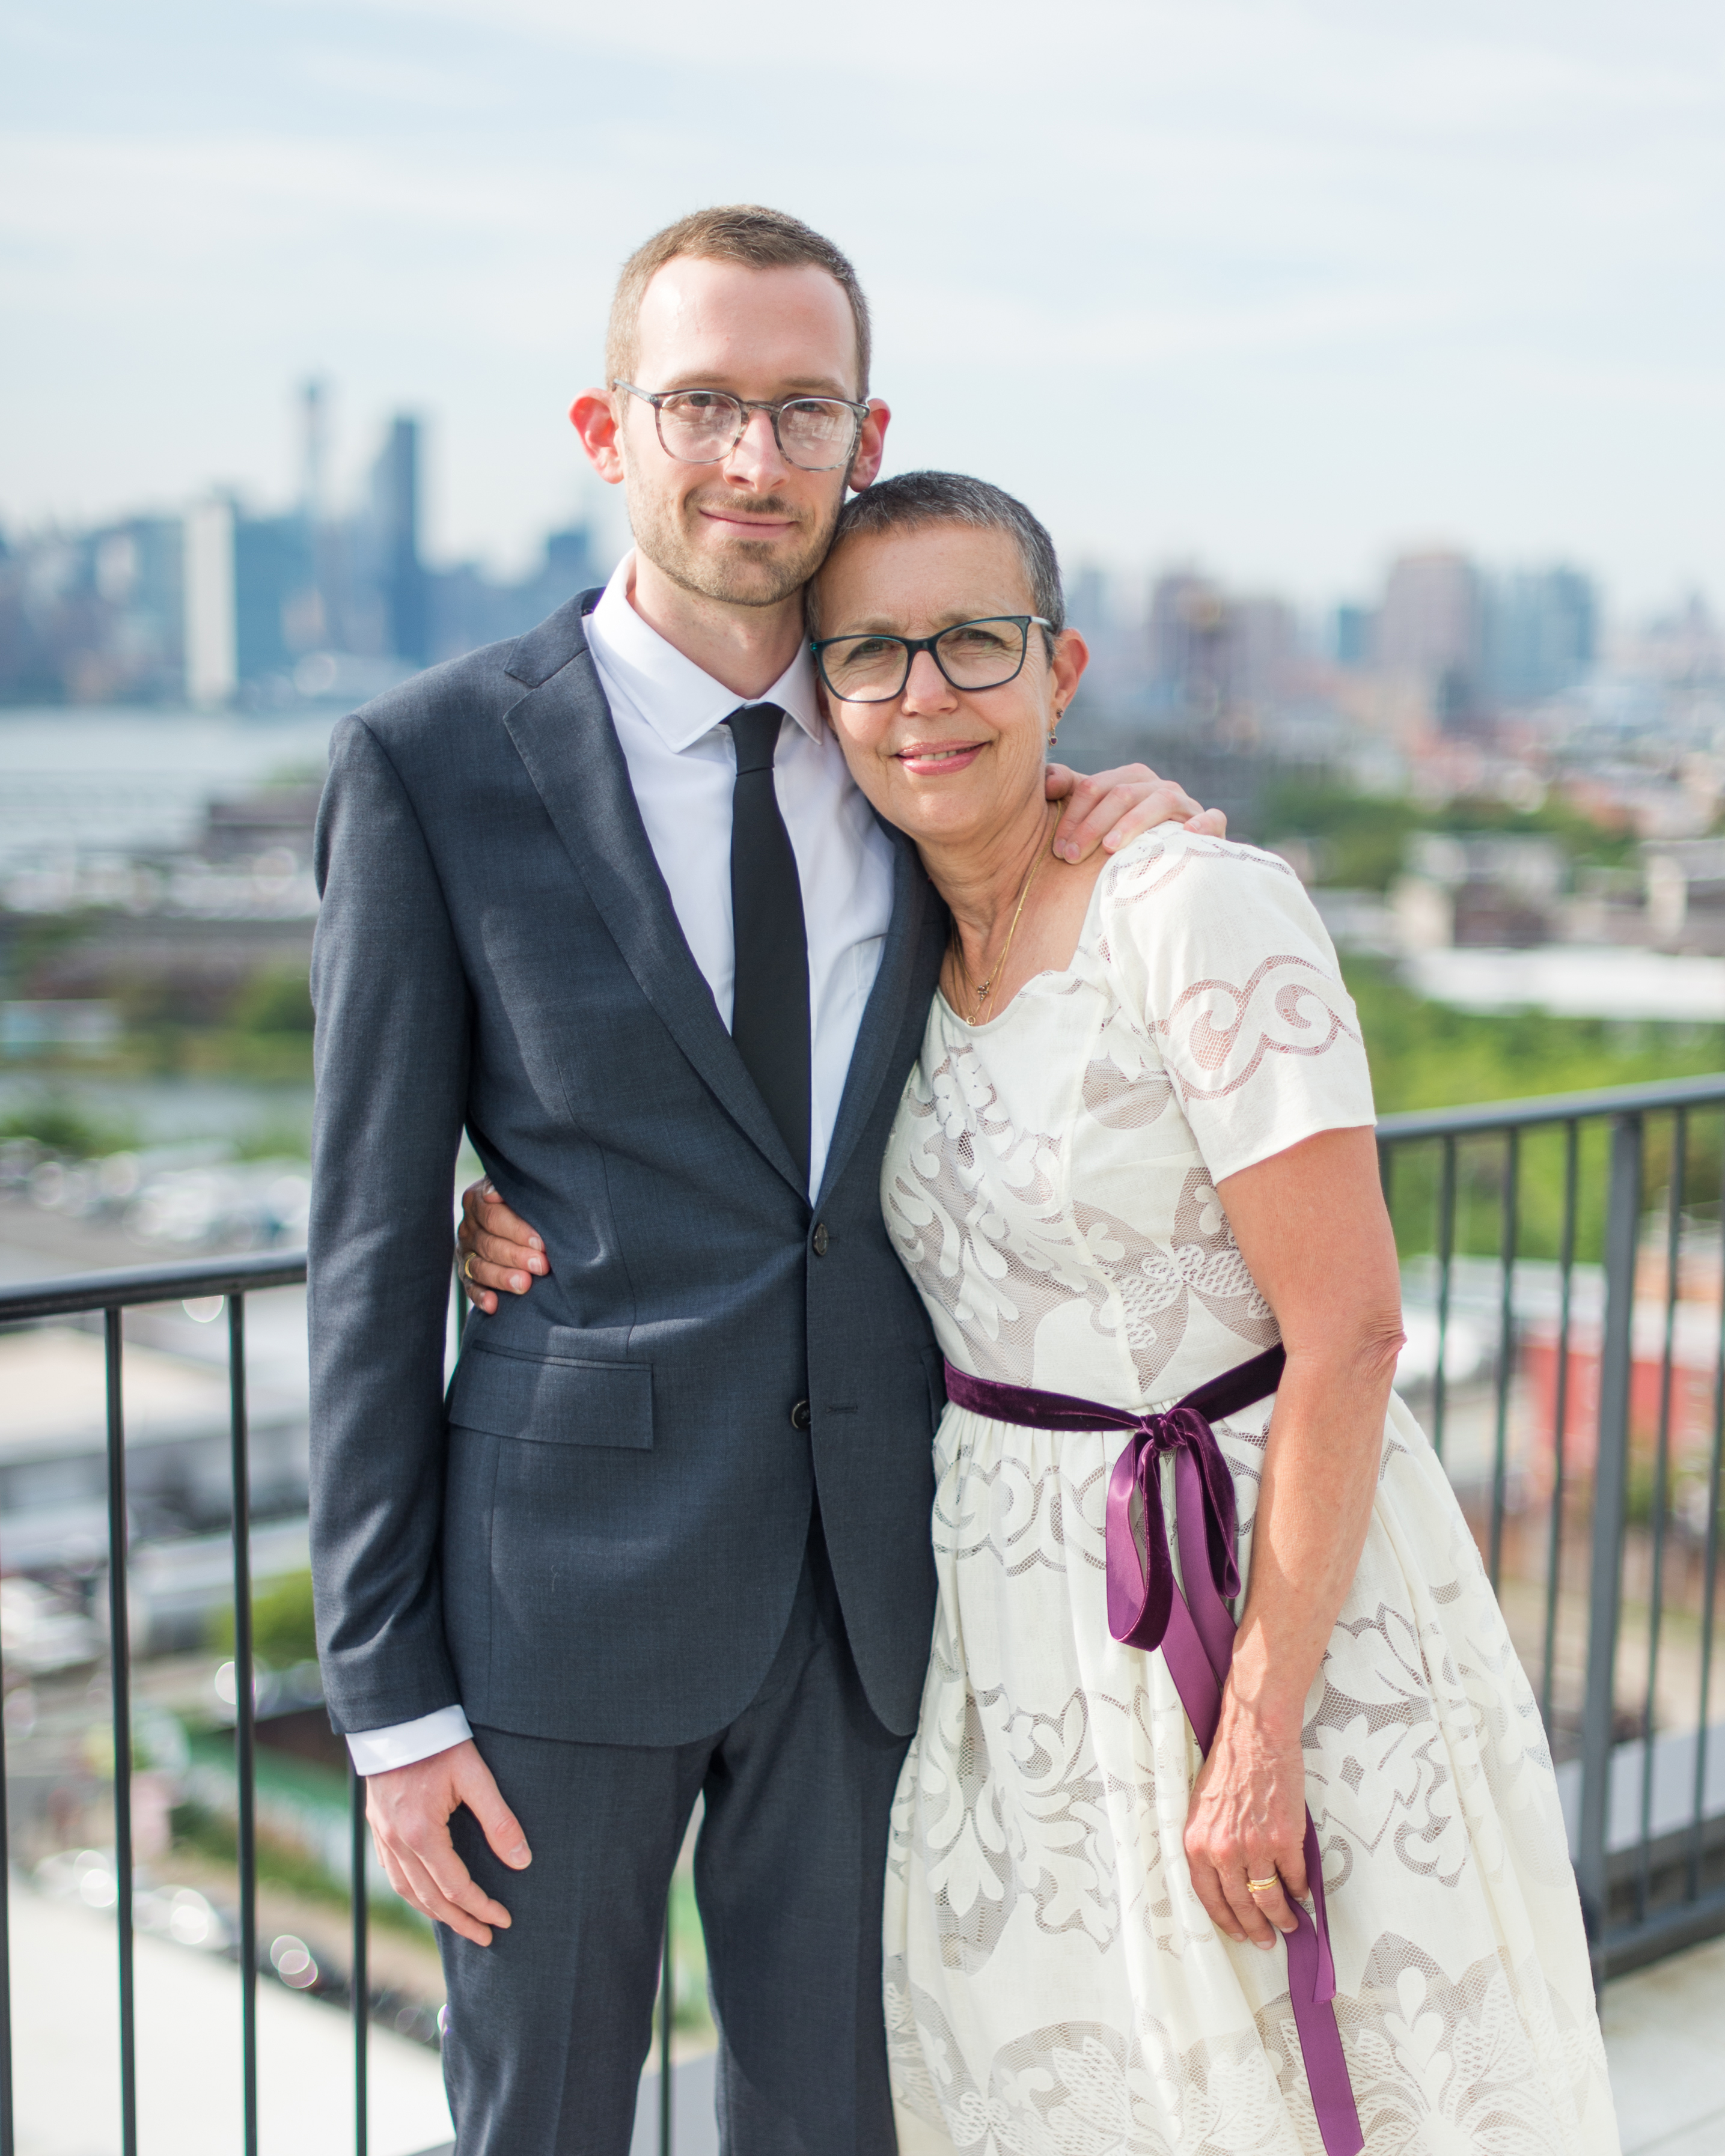 caitlin-michael-wedding-mom-164-s111835-0415.jpg